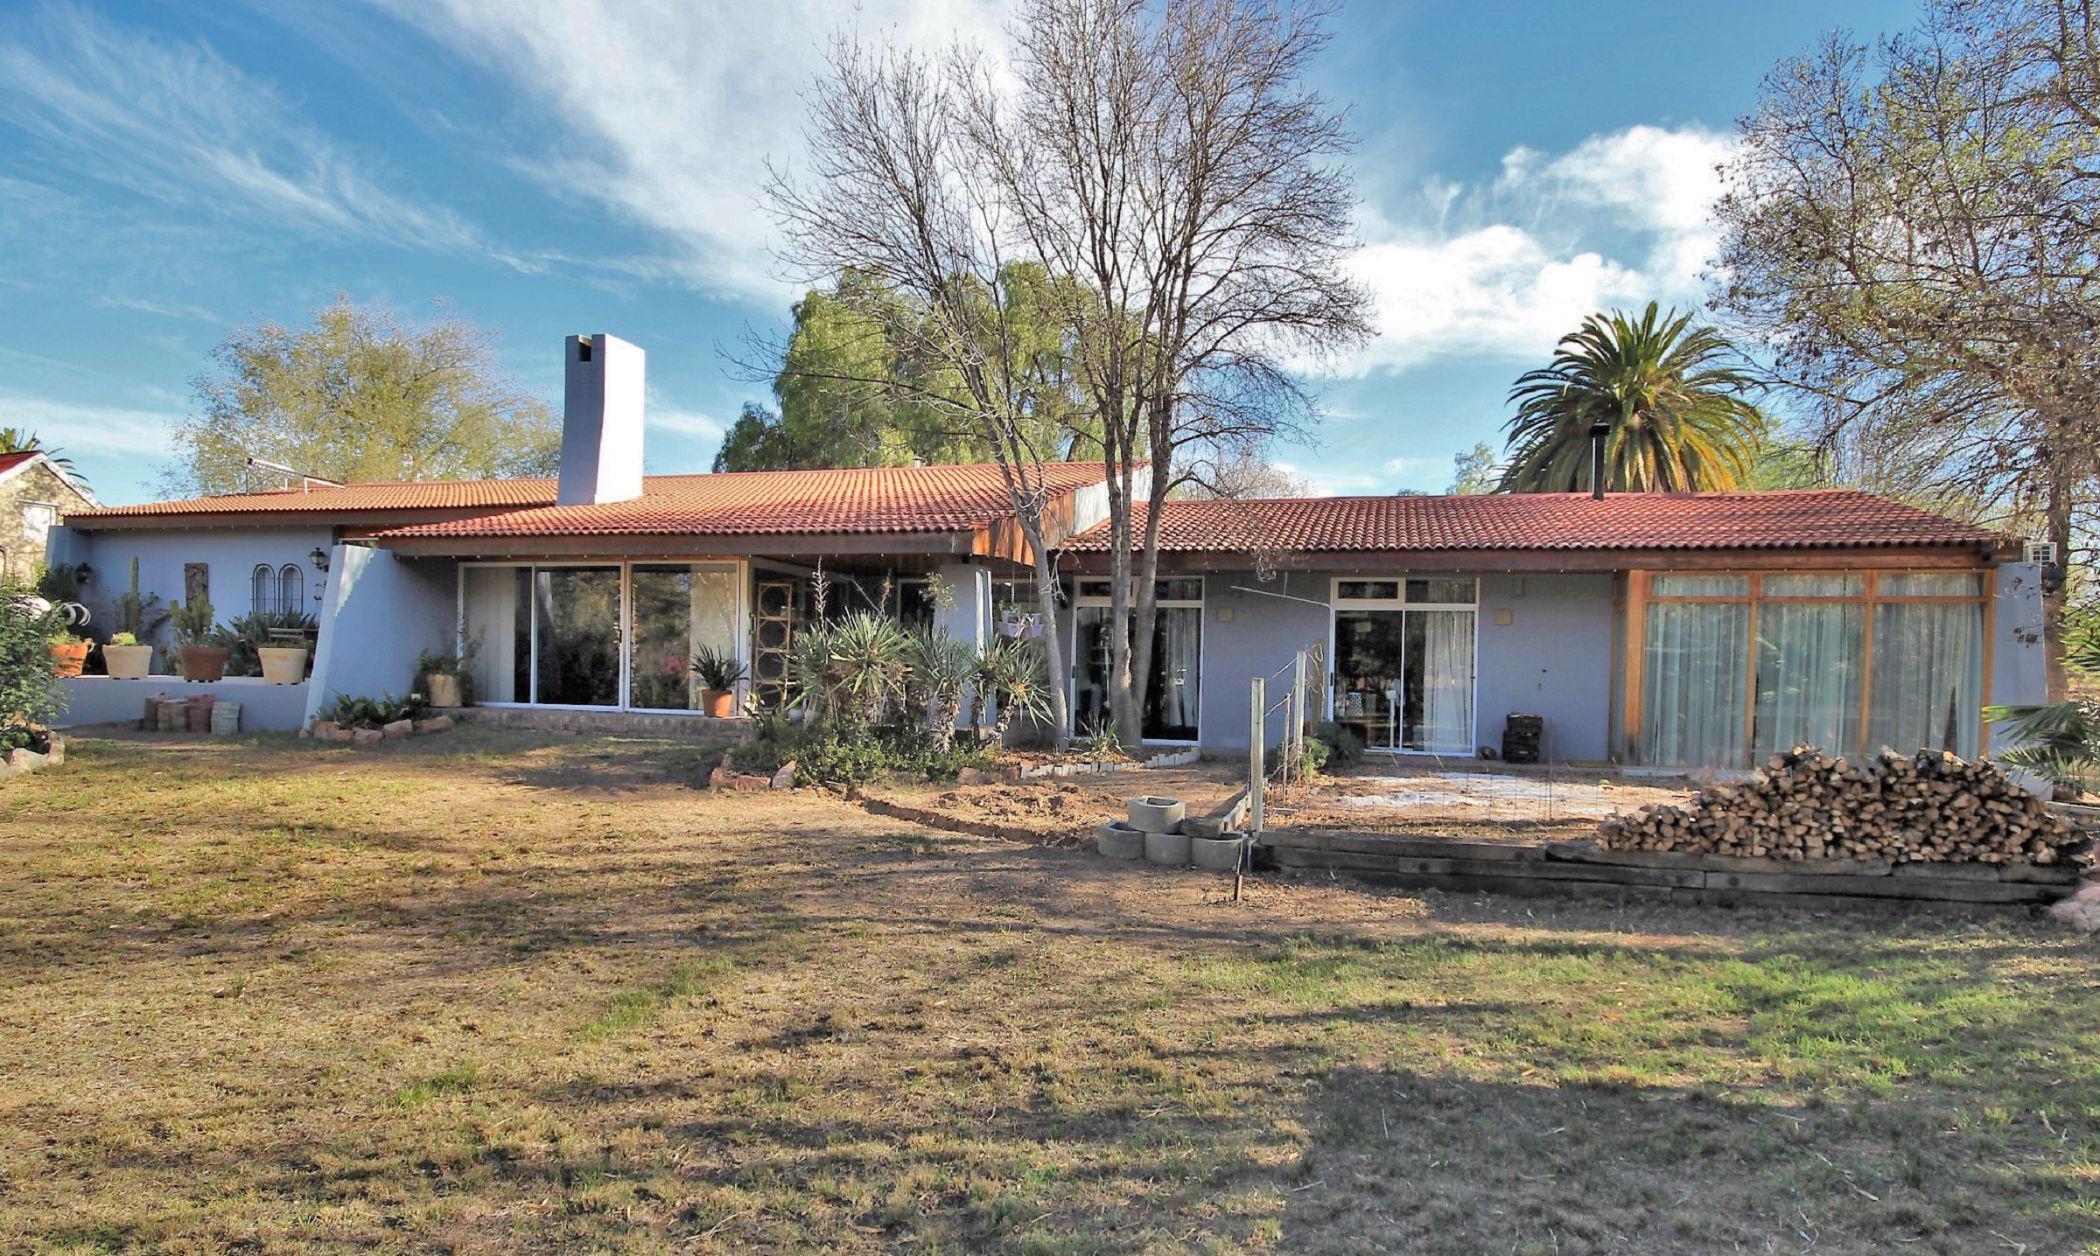 12 bedroom house for sale in West Bank (Oudtshoorn)